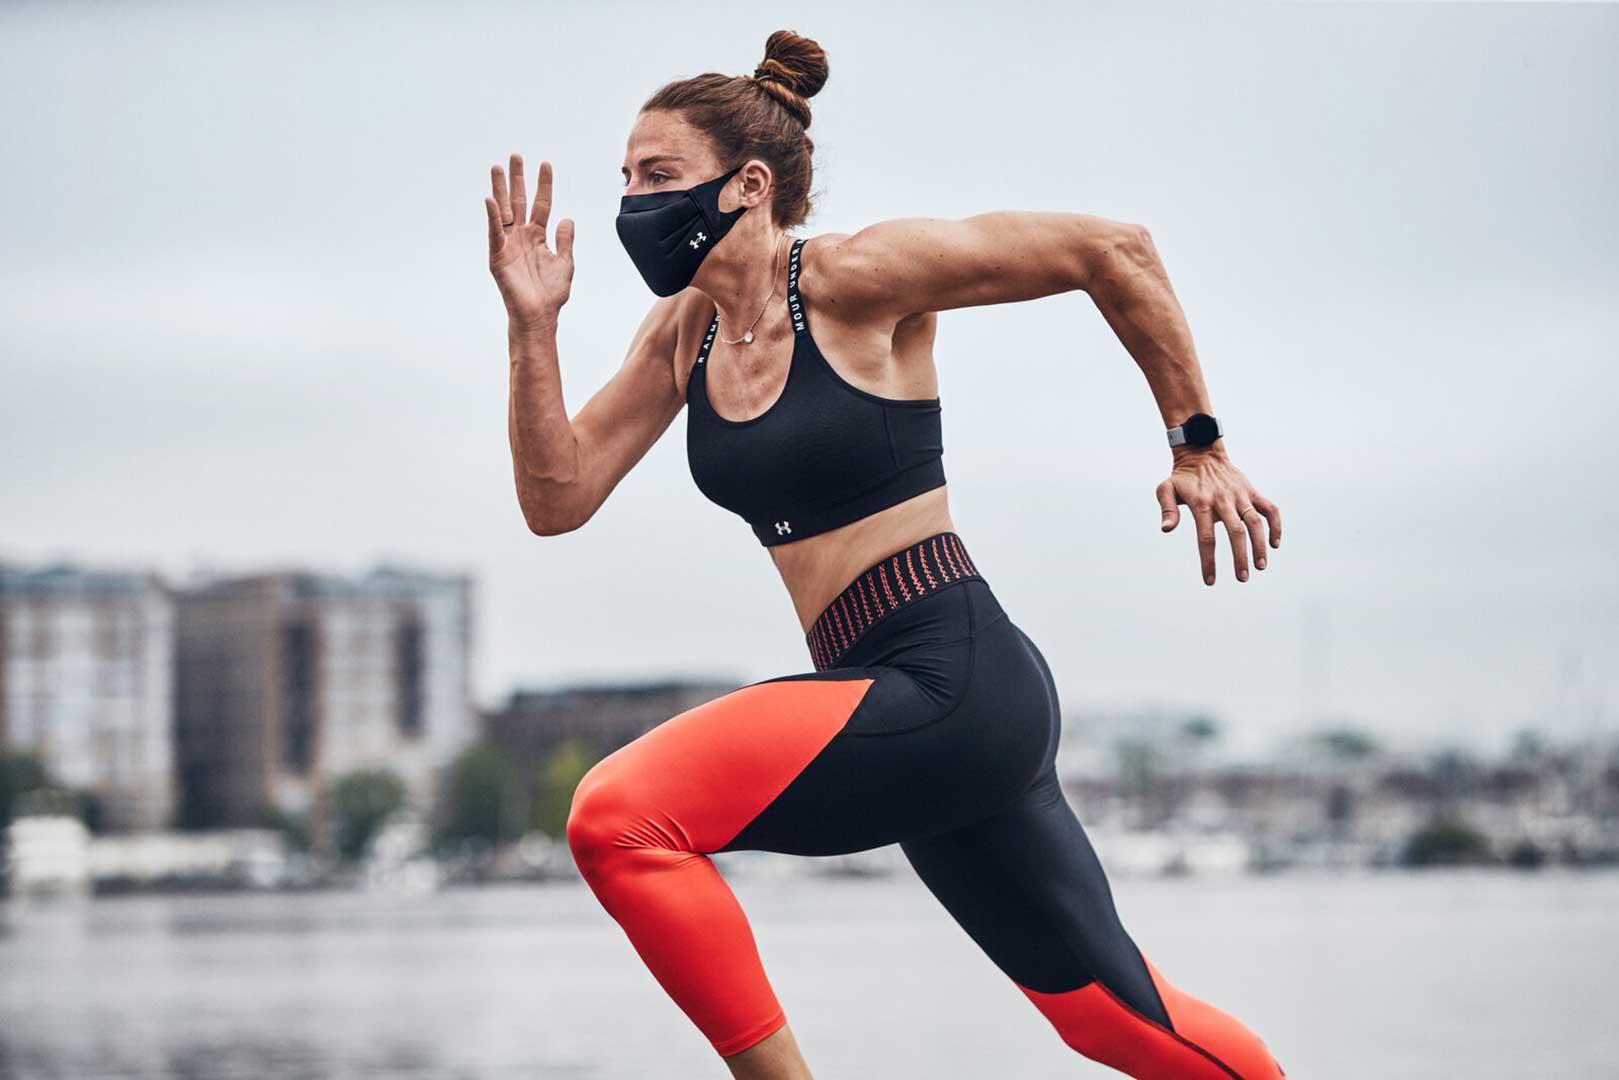 Best Face Masks For Exercise